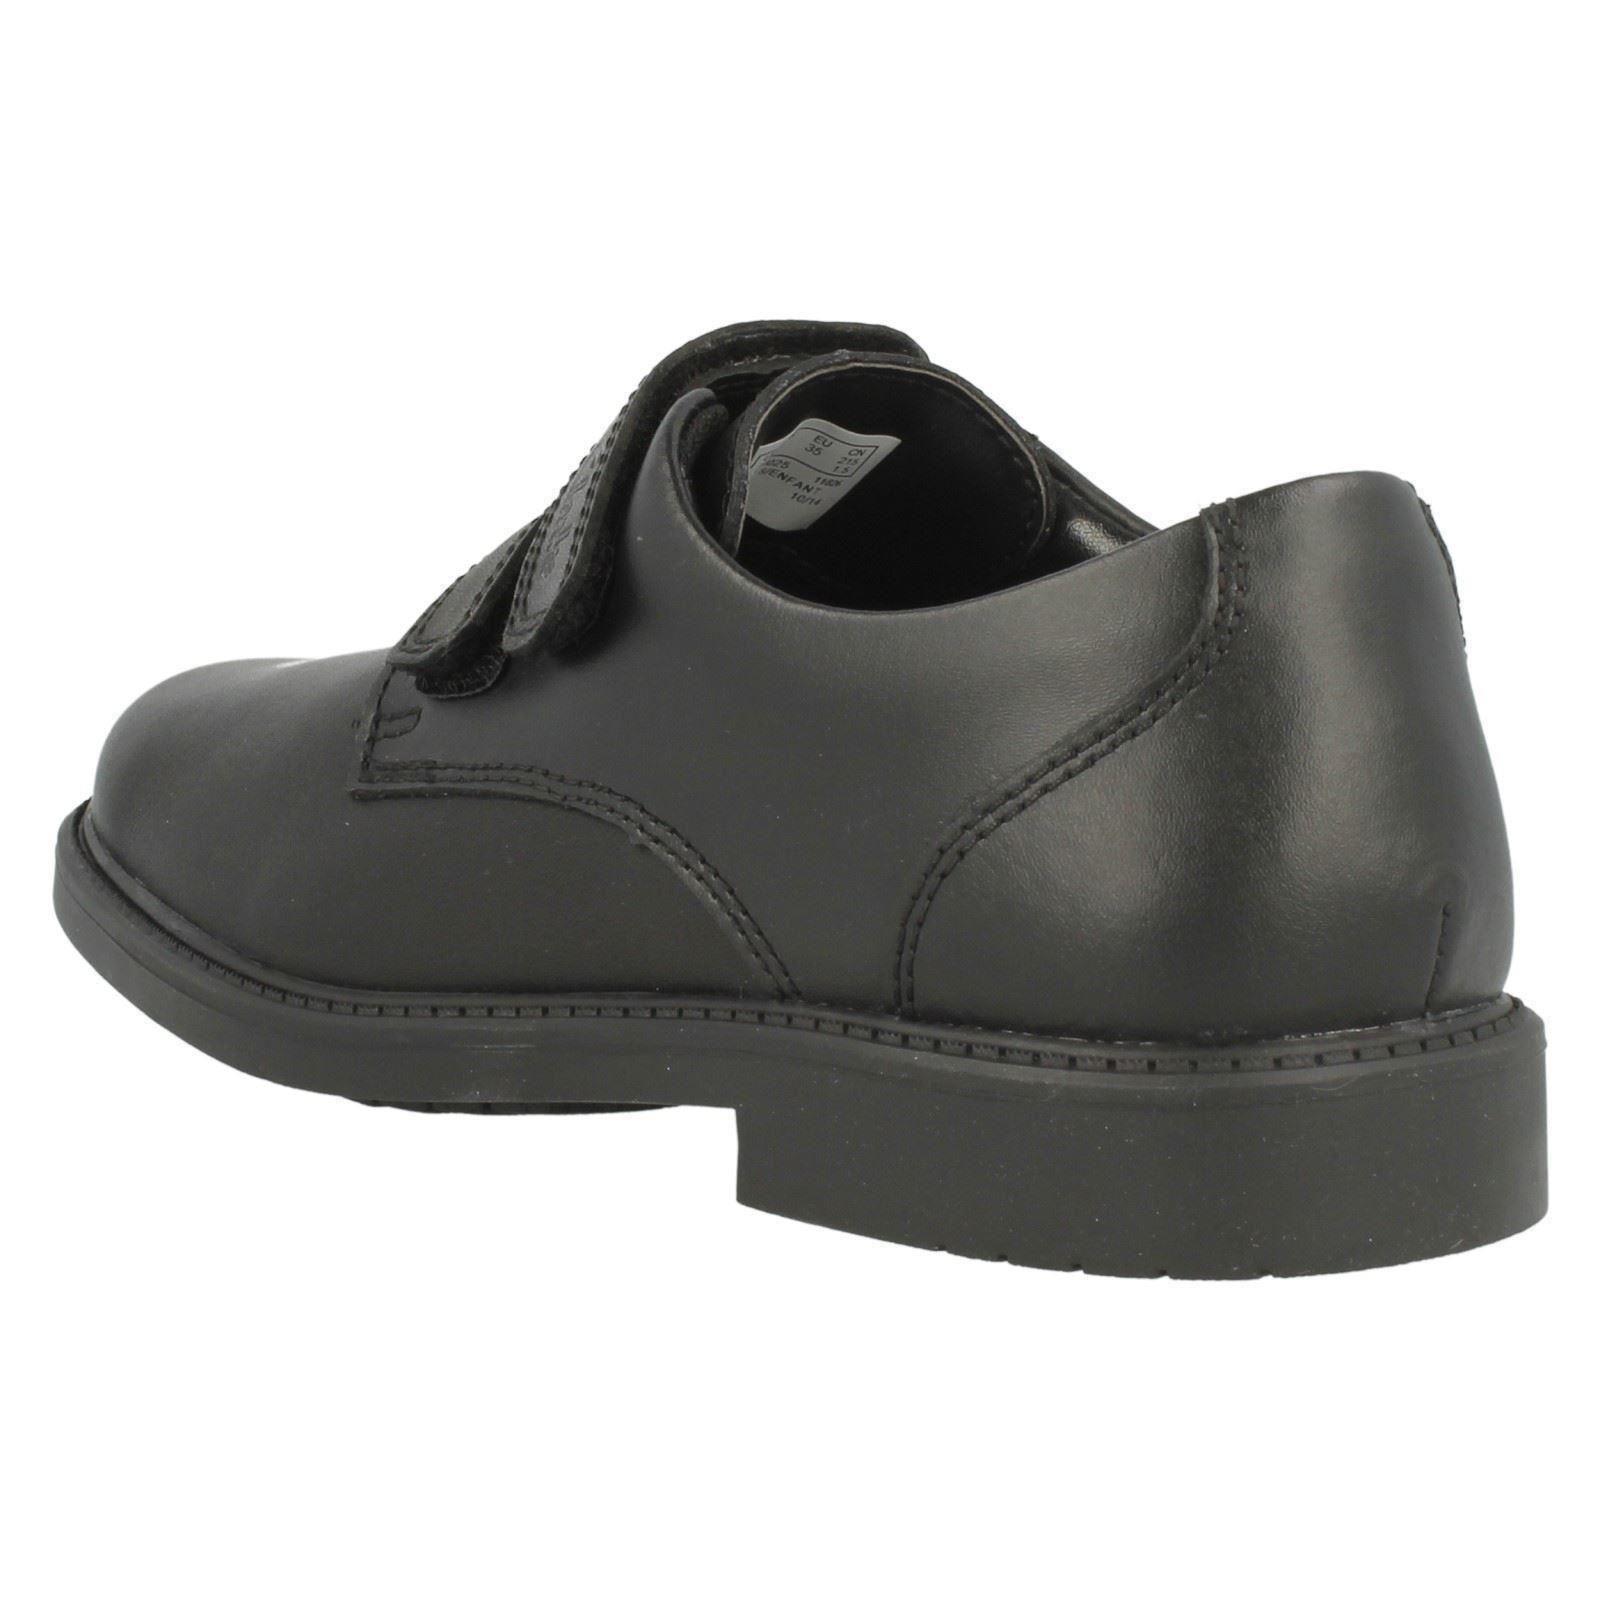 Boys Clarks School Shoes *Deon Style*